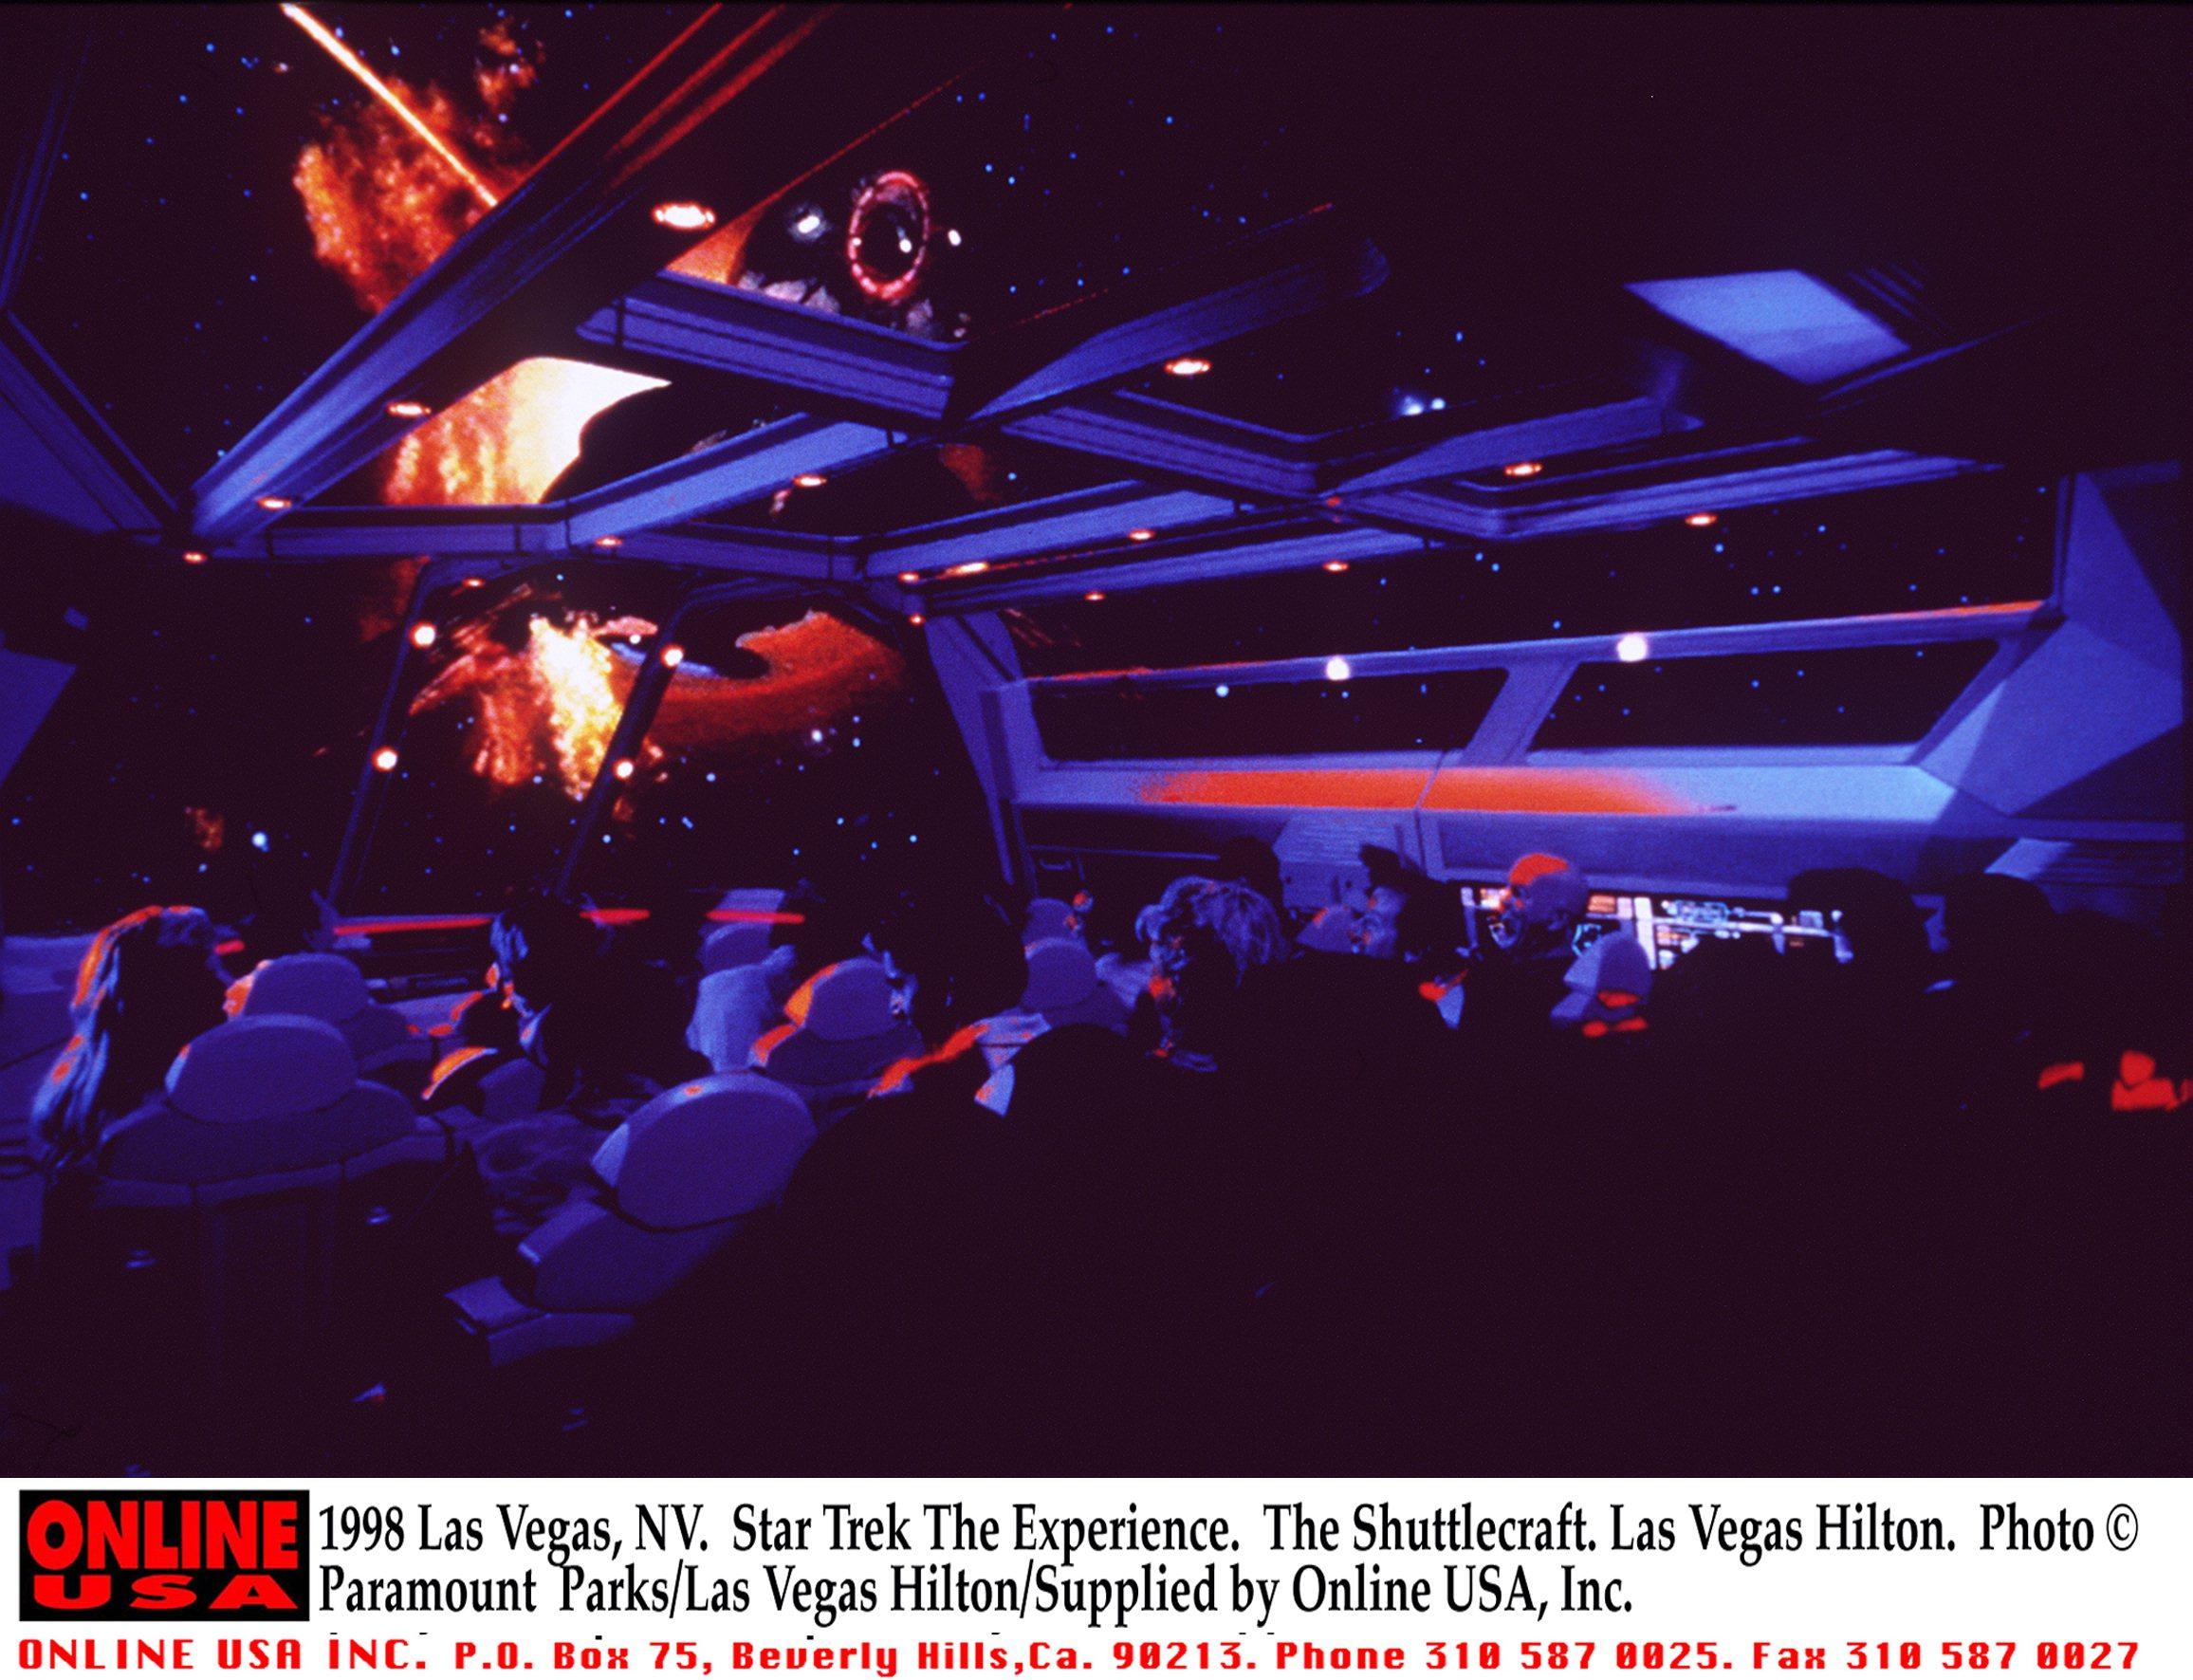 1998 Las Vegas, NV. Star Trek The Experience. The Shuttlecraft. Las Vegas Hilton. Paramount Parks/La